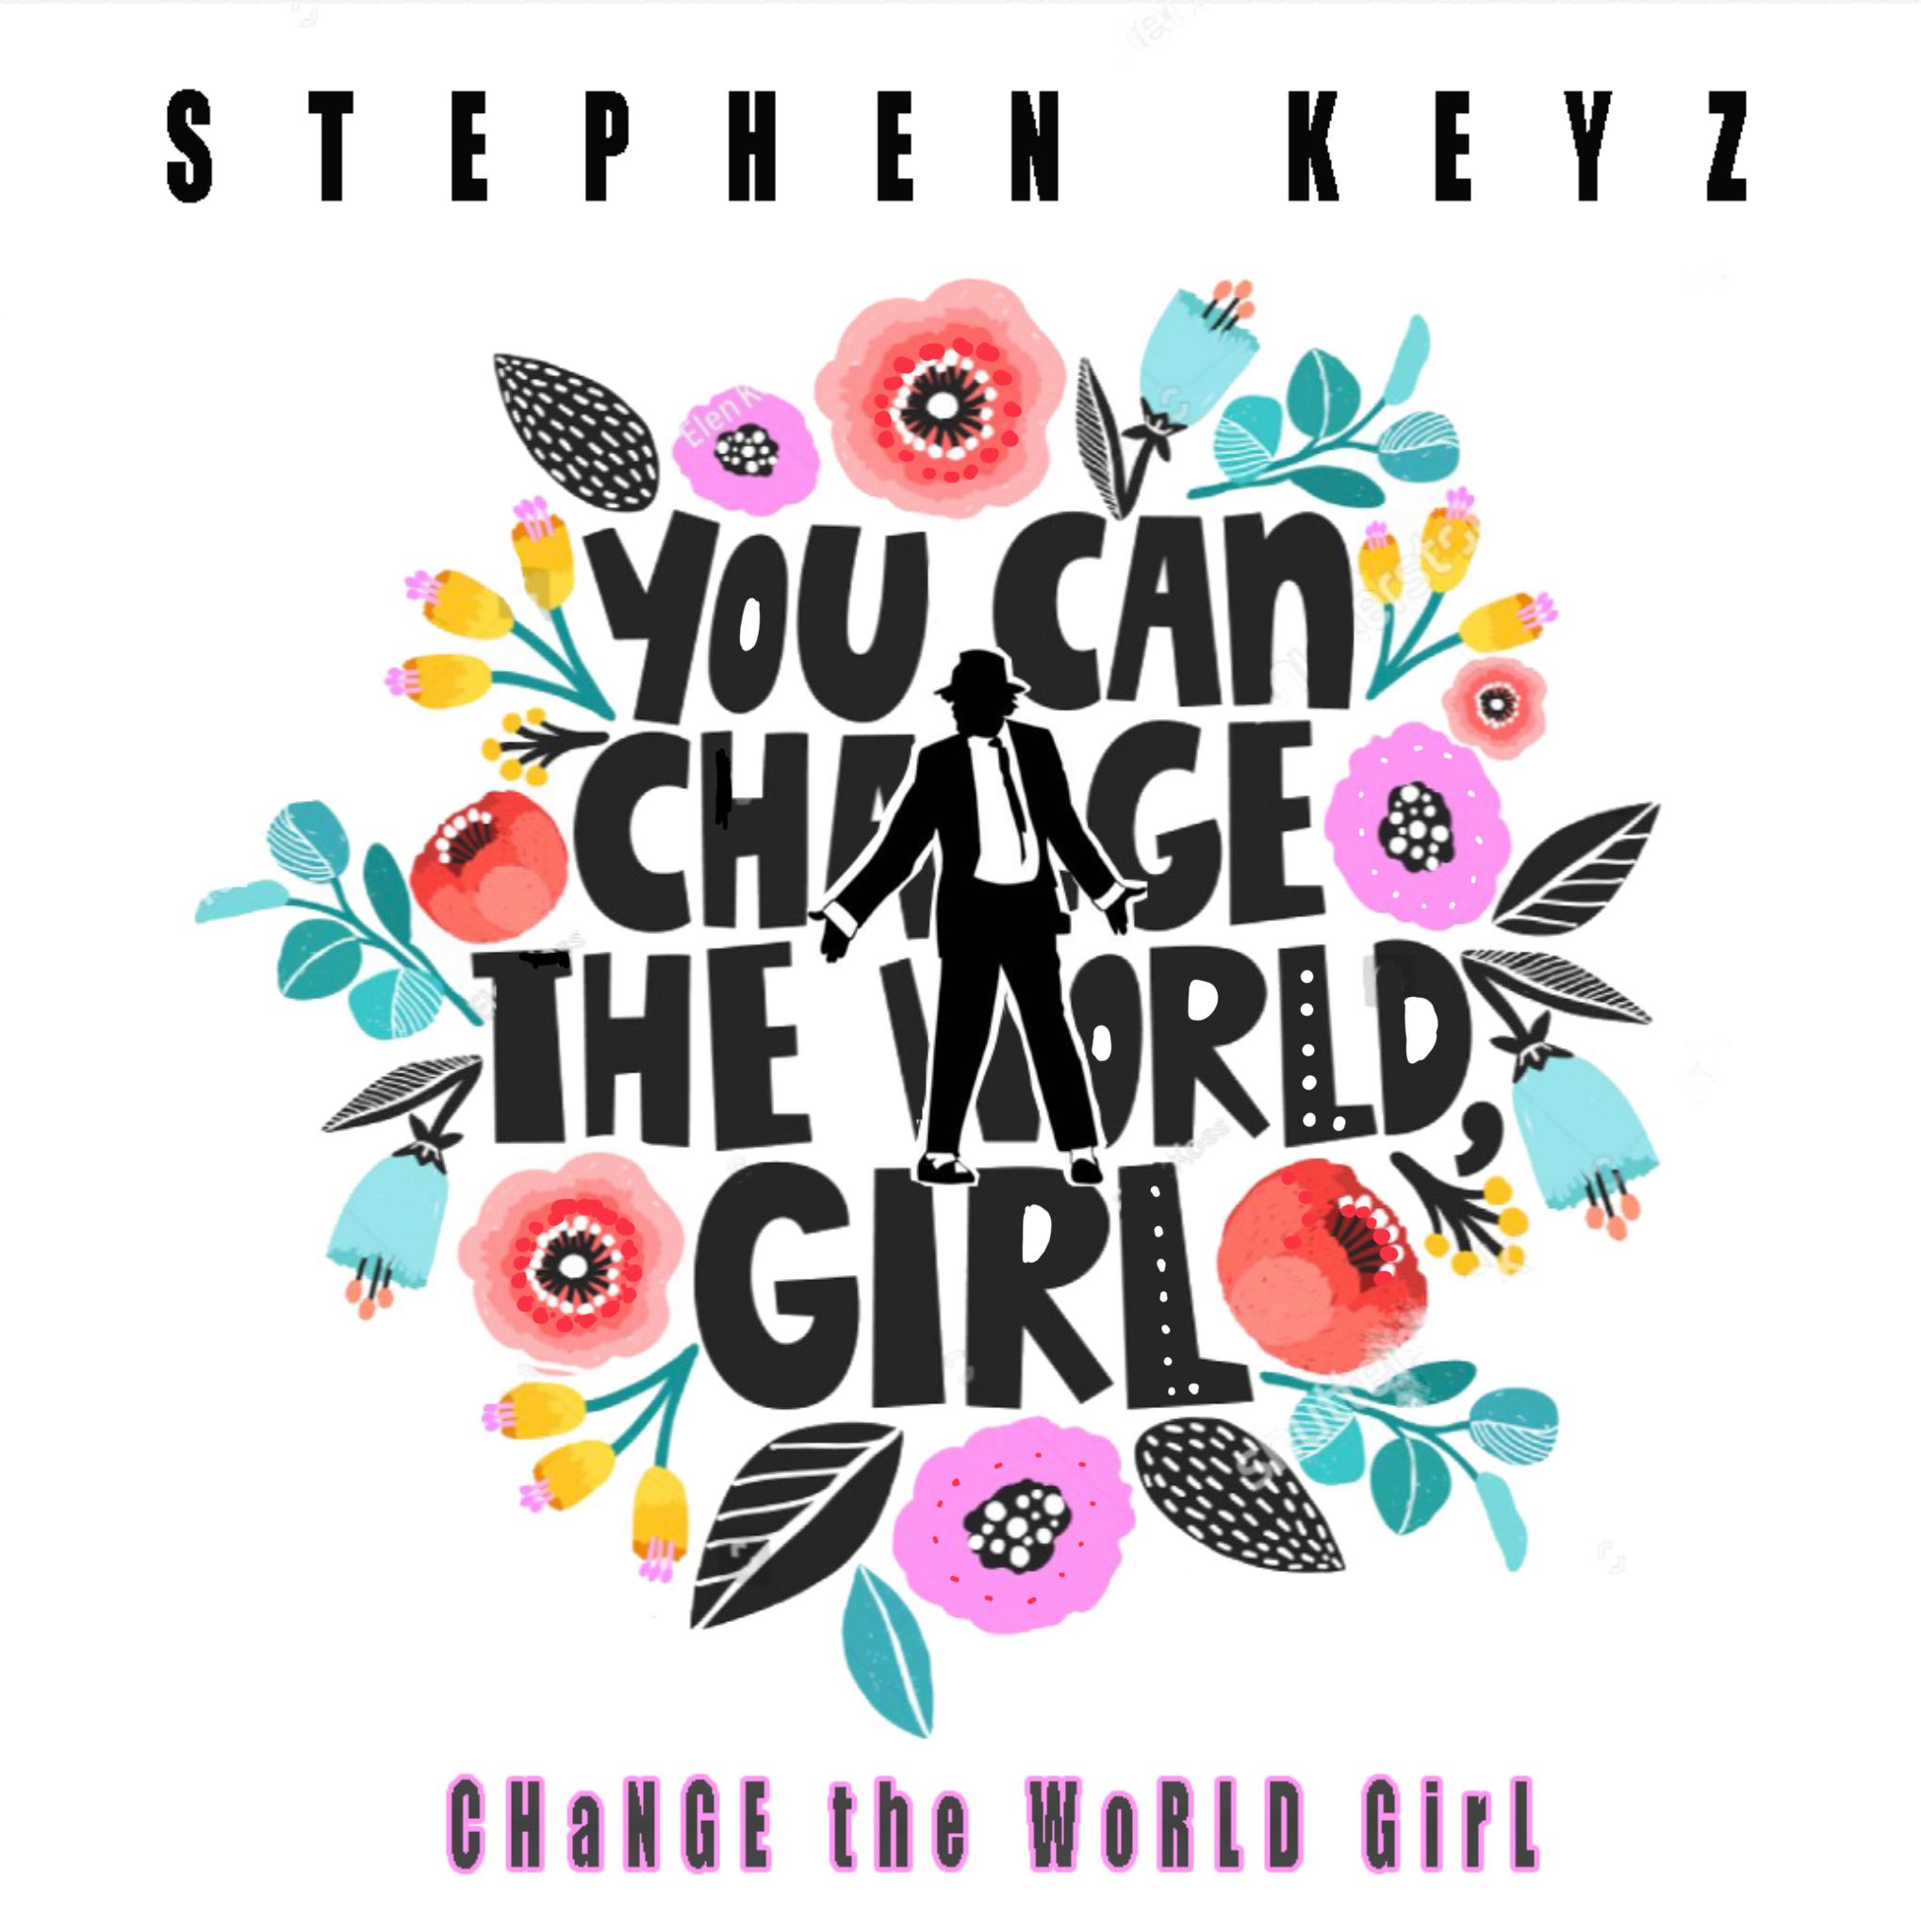 Change the world girl